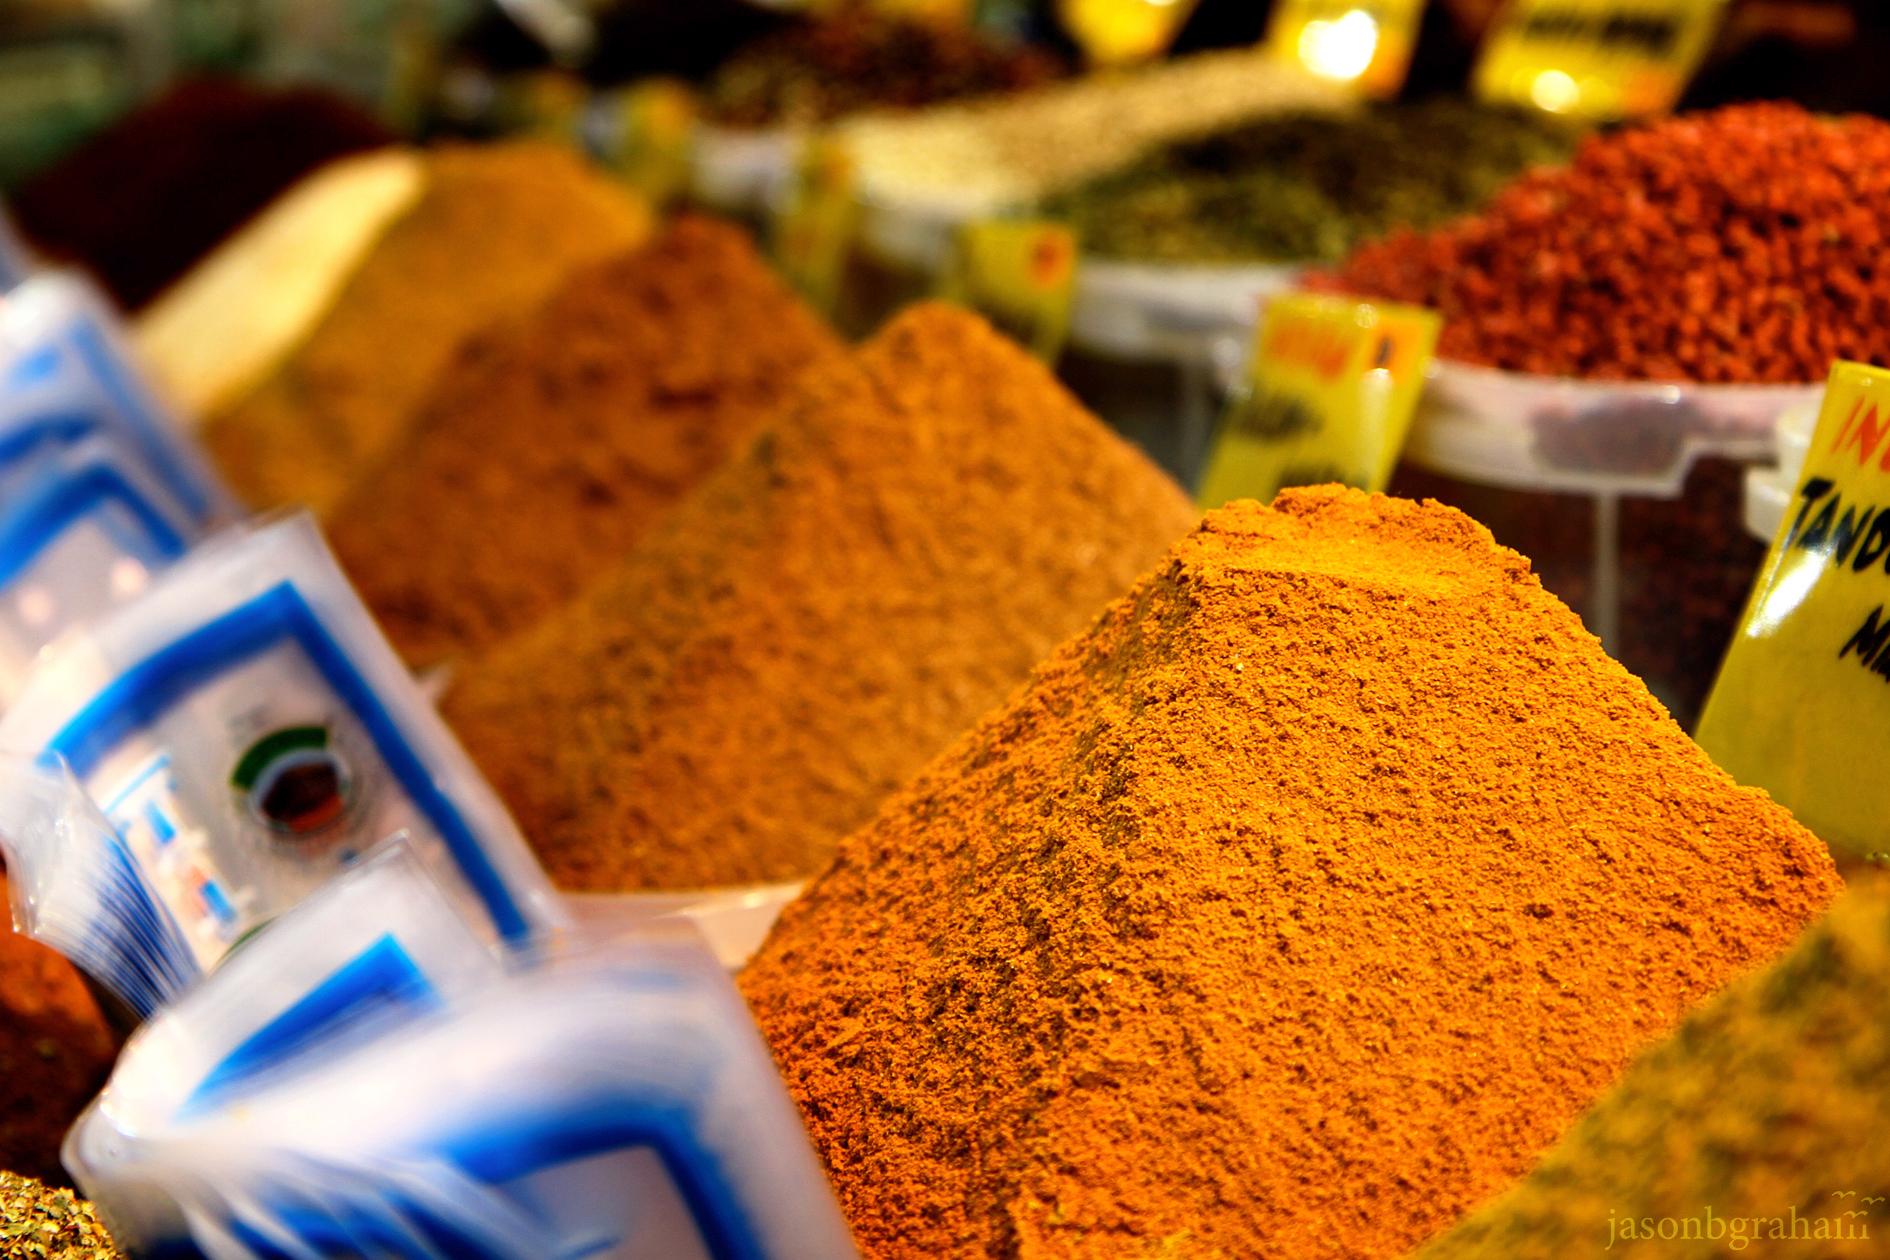 spice-market-4378